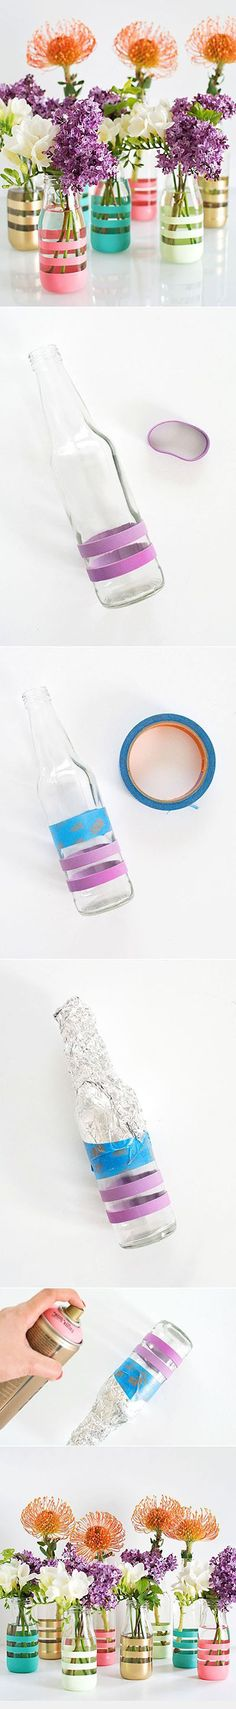 DIY Upcycling Glass Bottles Into Vases - Amazing Diy Crafts Wine Bottle Crafts, Mason Jar Crafts, Bottle Art, Mason Jars, Bottles And Jars, Glass Bottles, Paint Bottles, Fun Crafts, Diy And Crafts